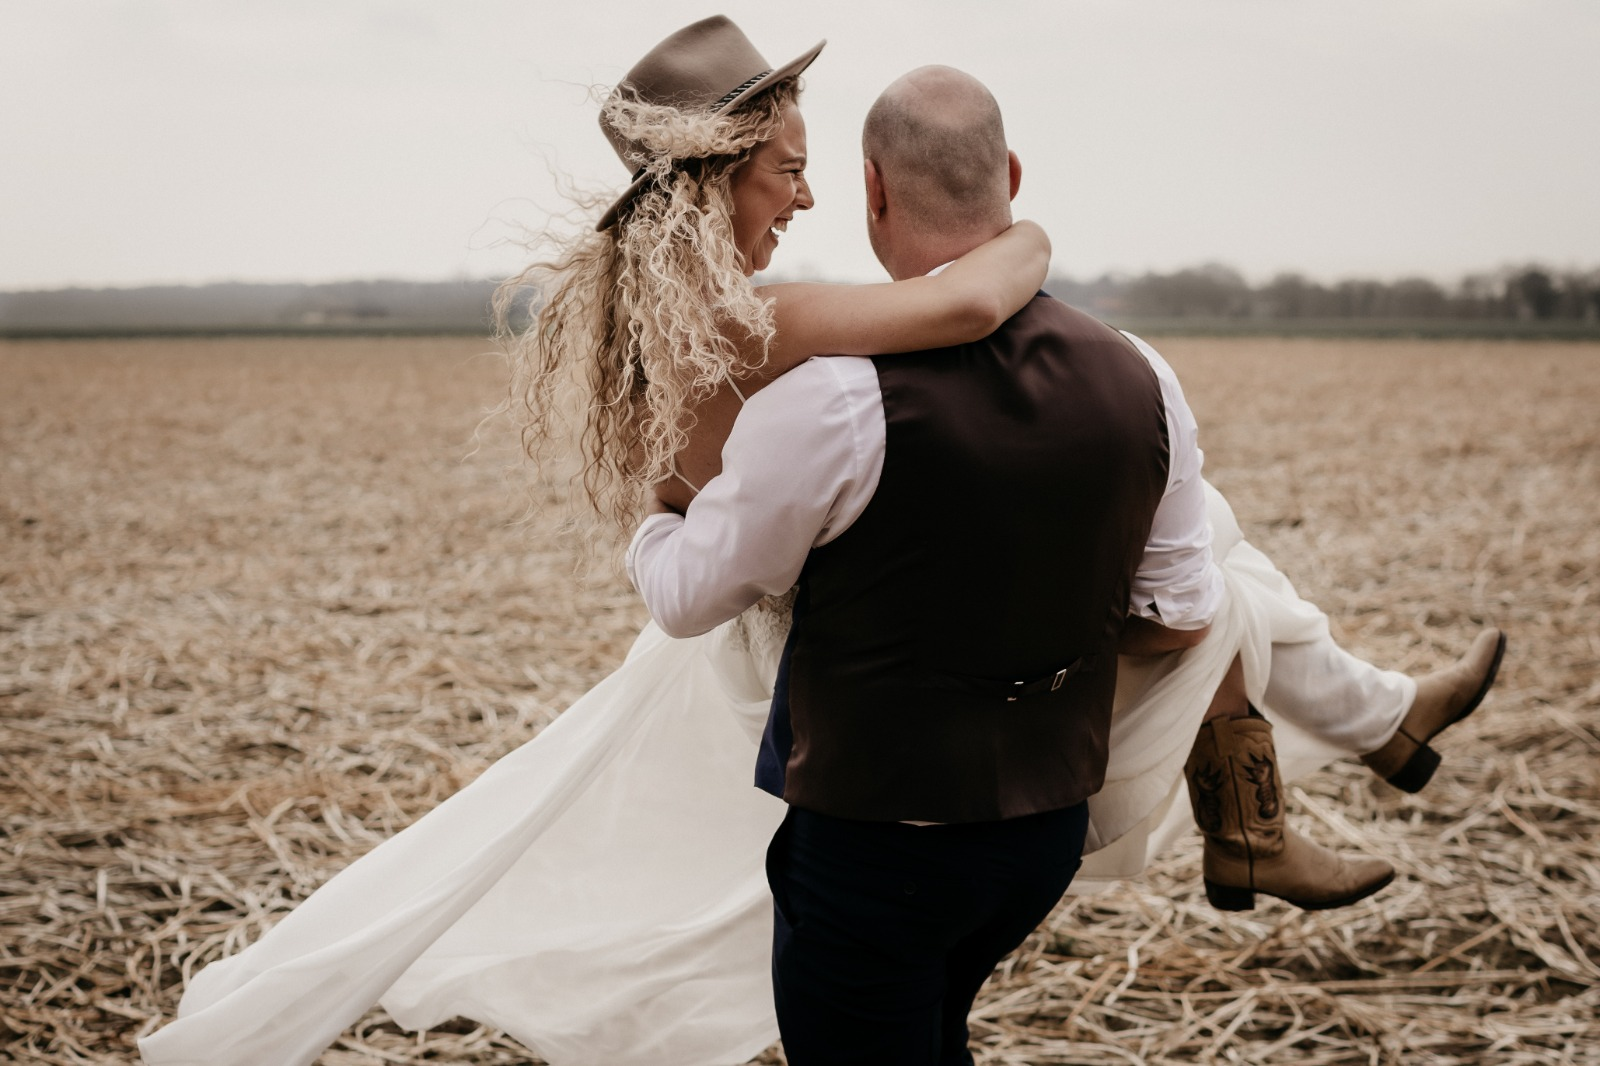 bruidsboetiek-de-blauwe-hoeve-bruidswinkel-apeldoorn-gelderland-bruidsfestival-